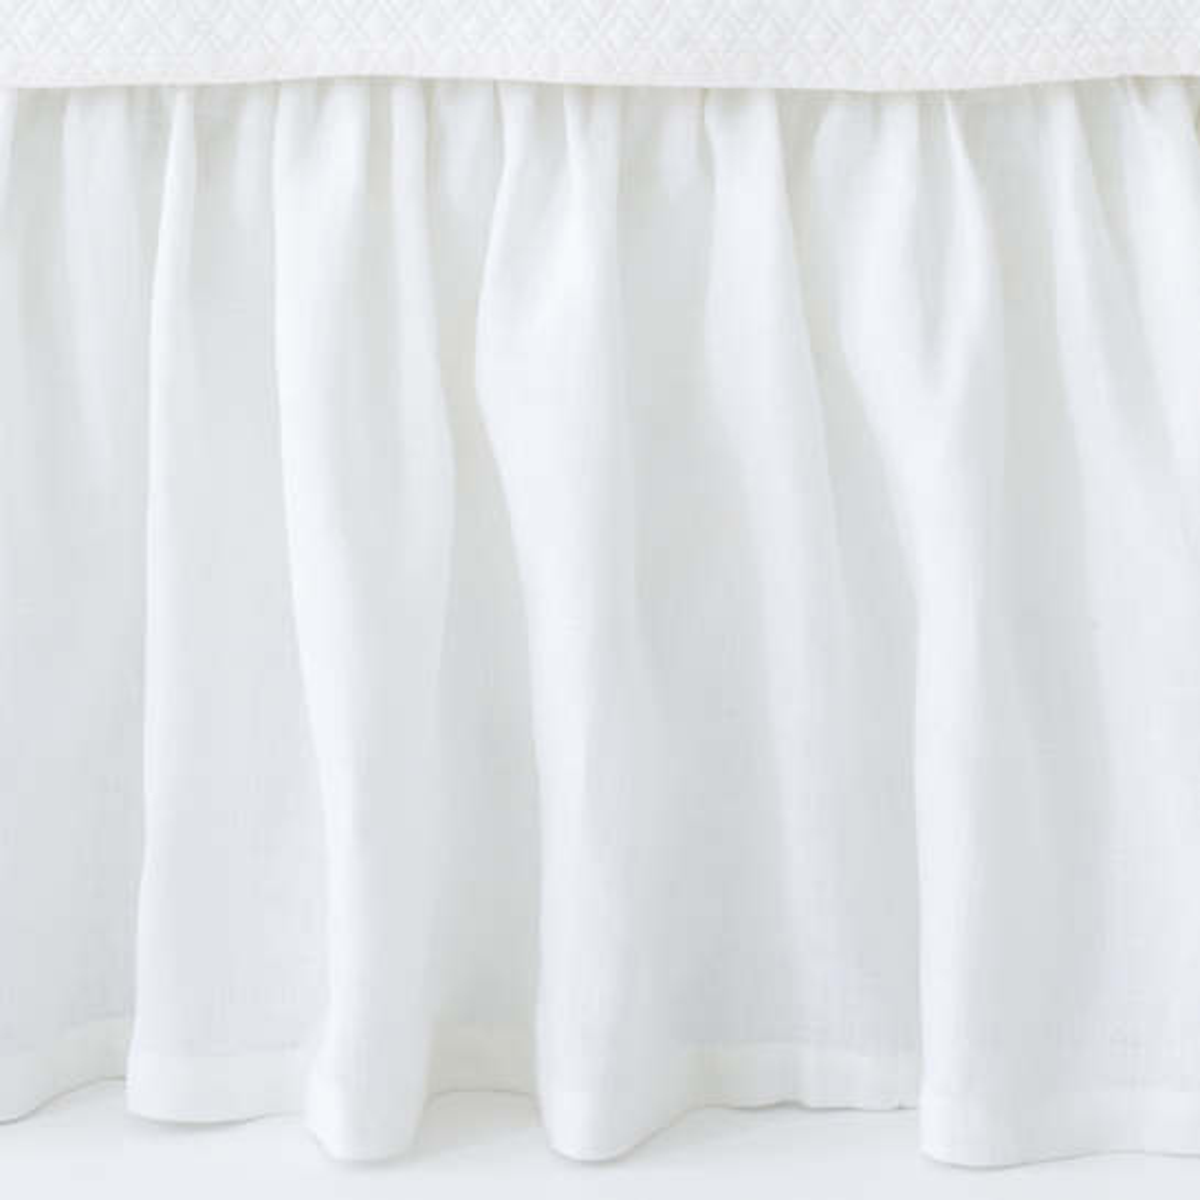 stone washed linen white paneled bed skirt